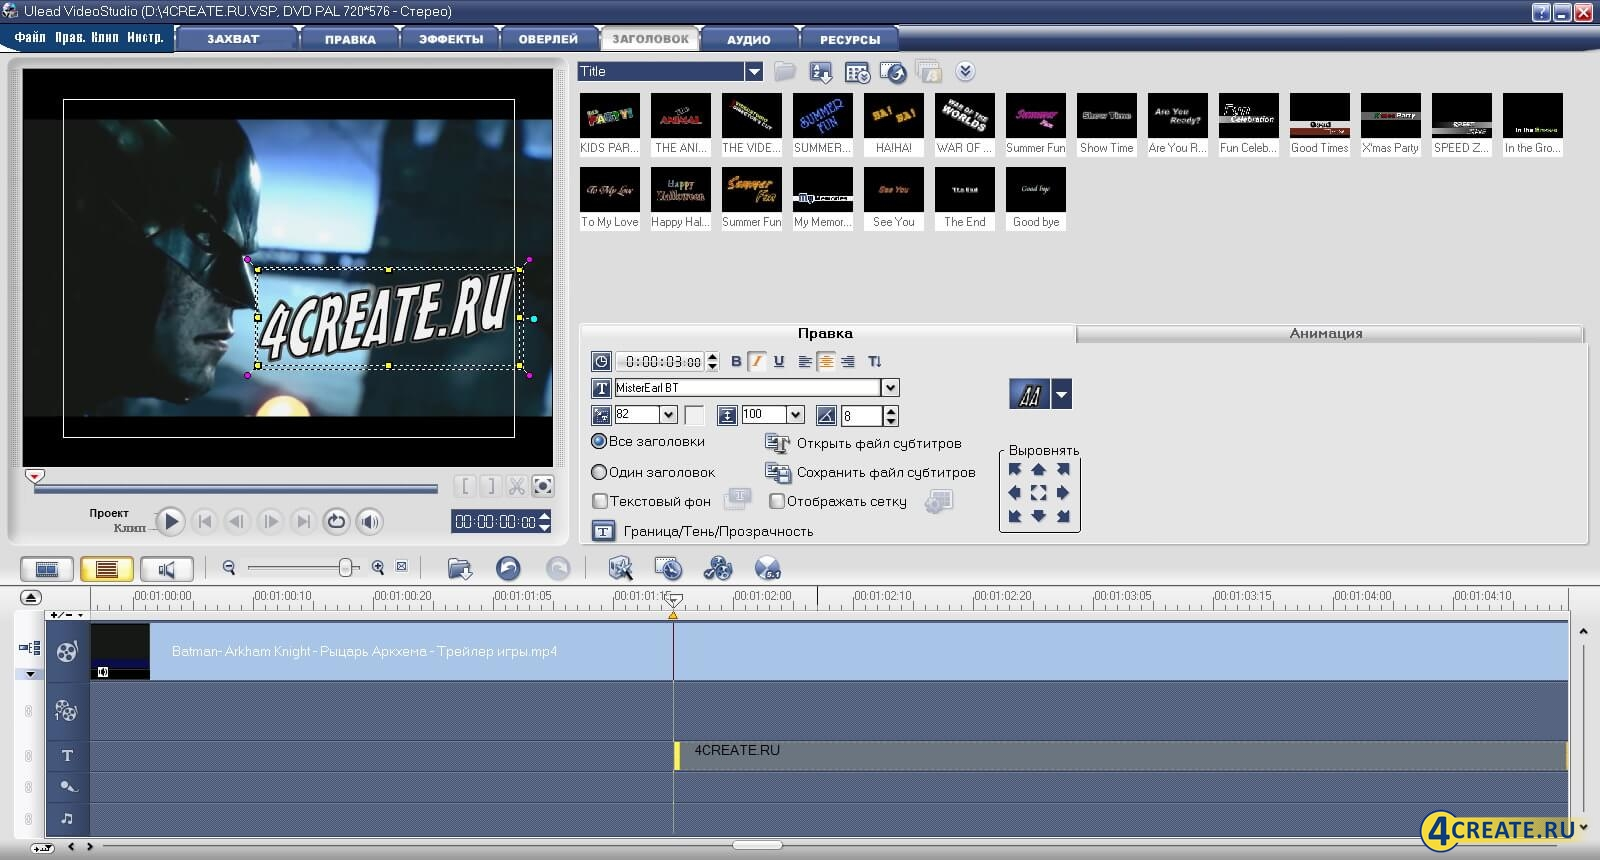 Ulead VideoStudio 11.5 (Скриншот 3)